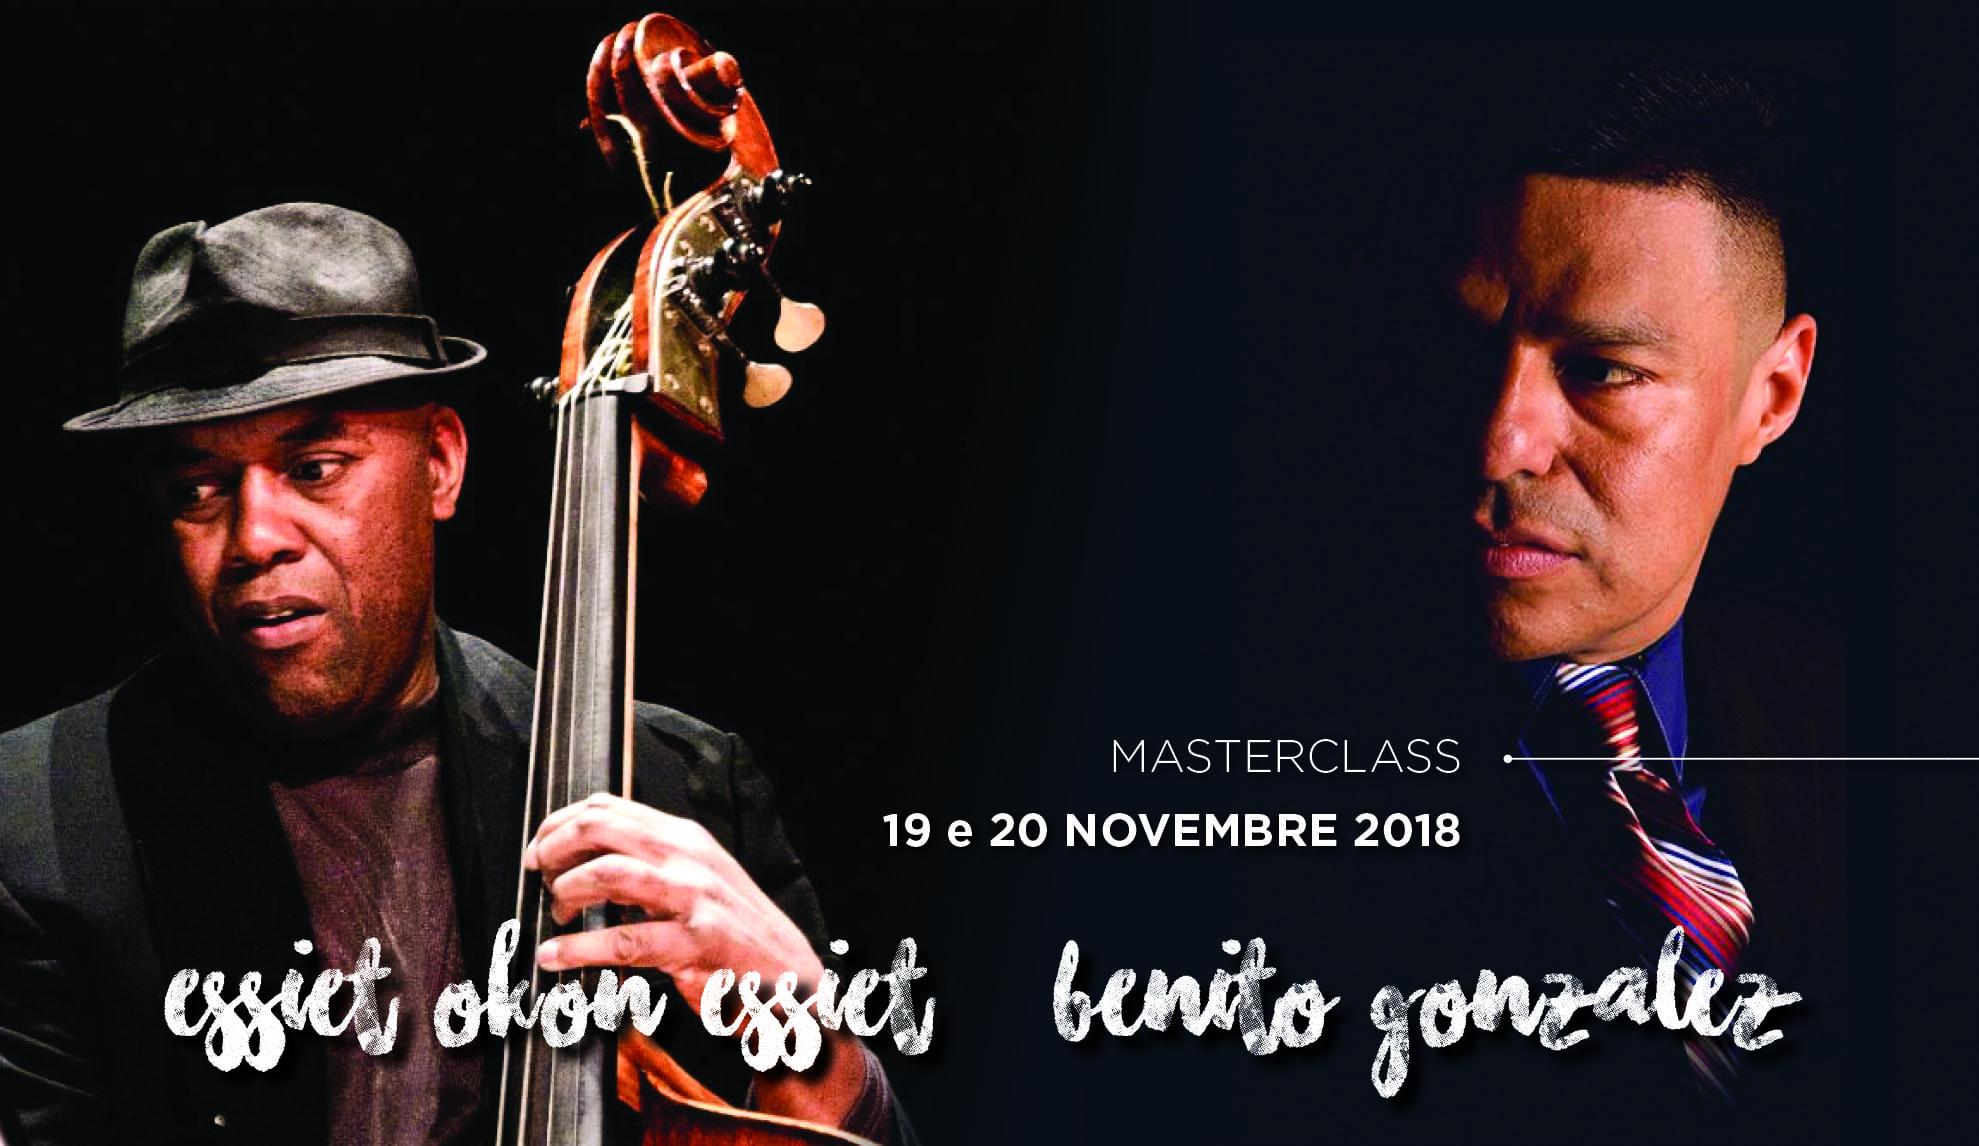 Benito Gonzalez & Essiet Okon Essiet master class